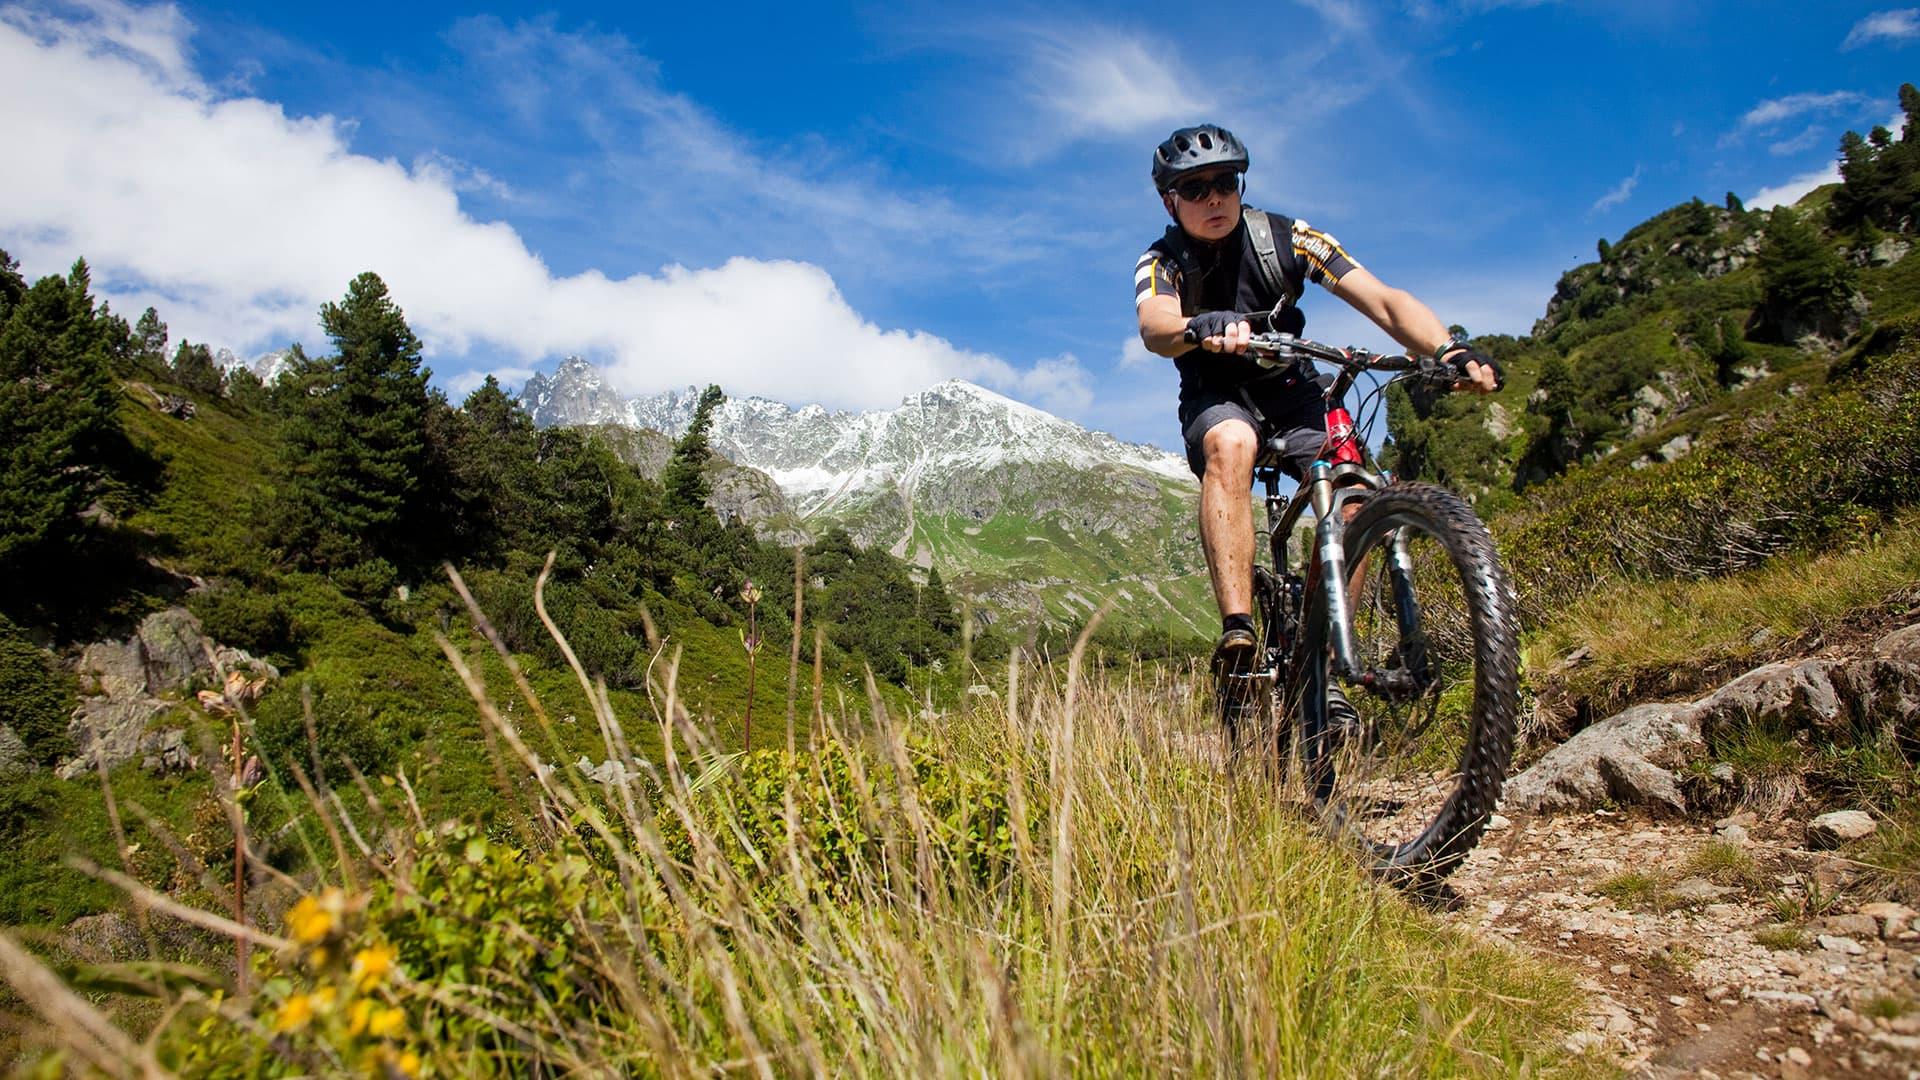 Mountainbike-Spass am Sustenpass!